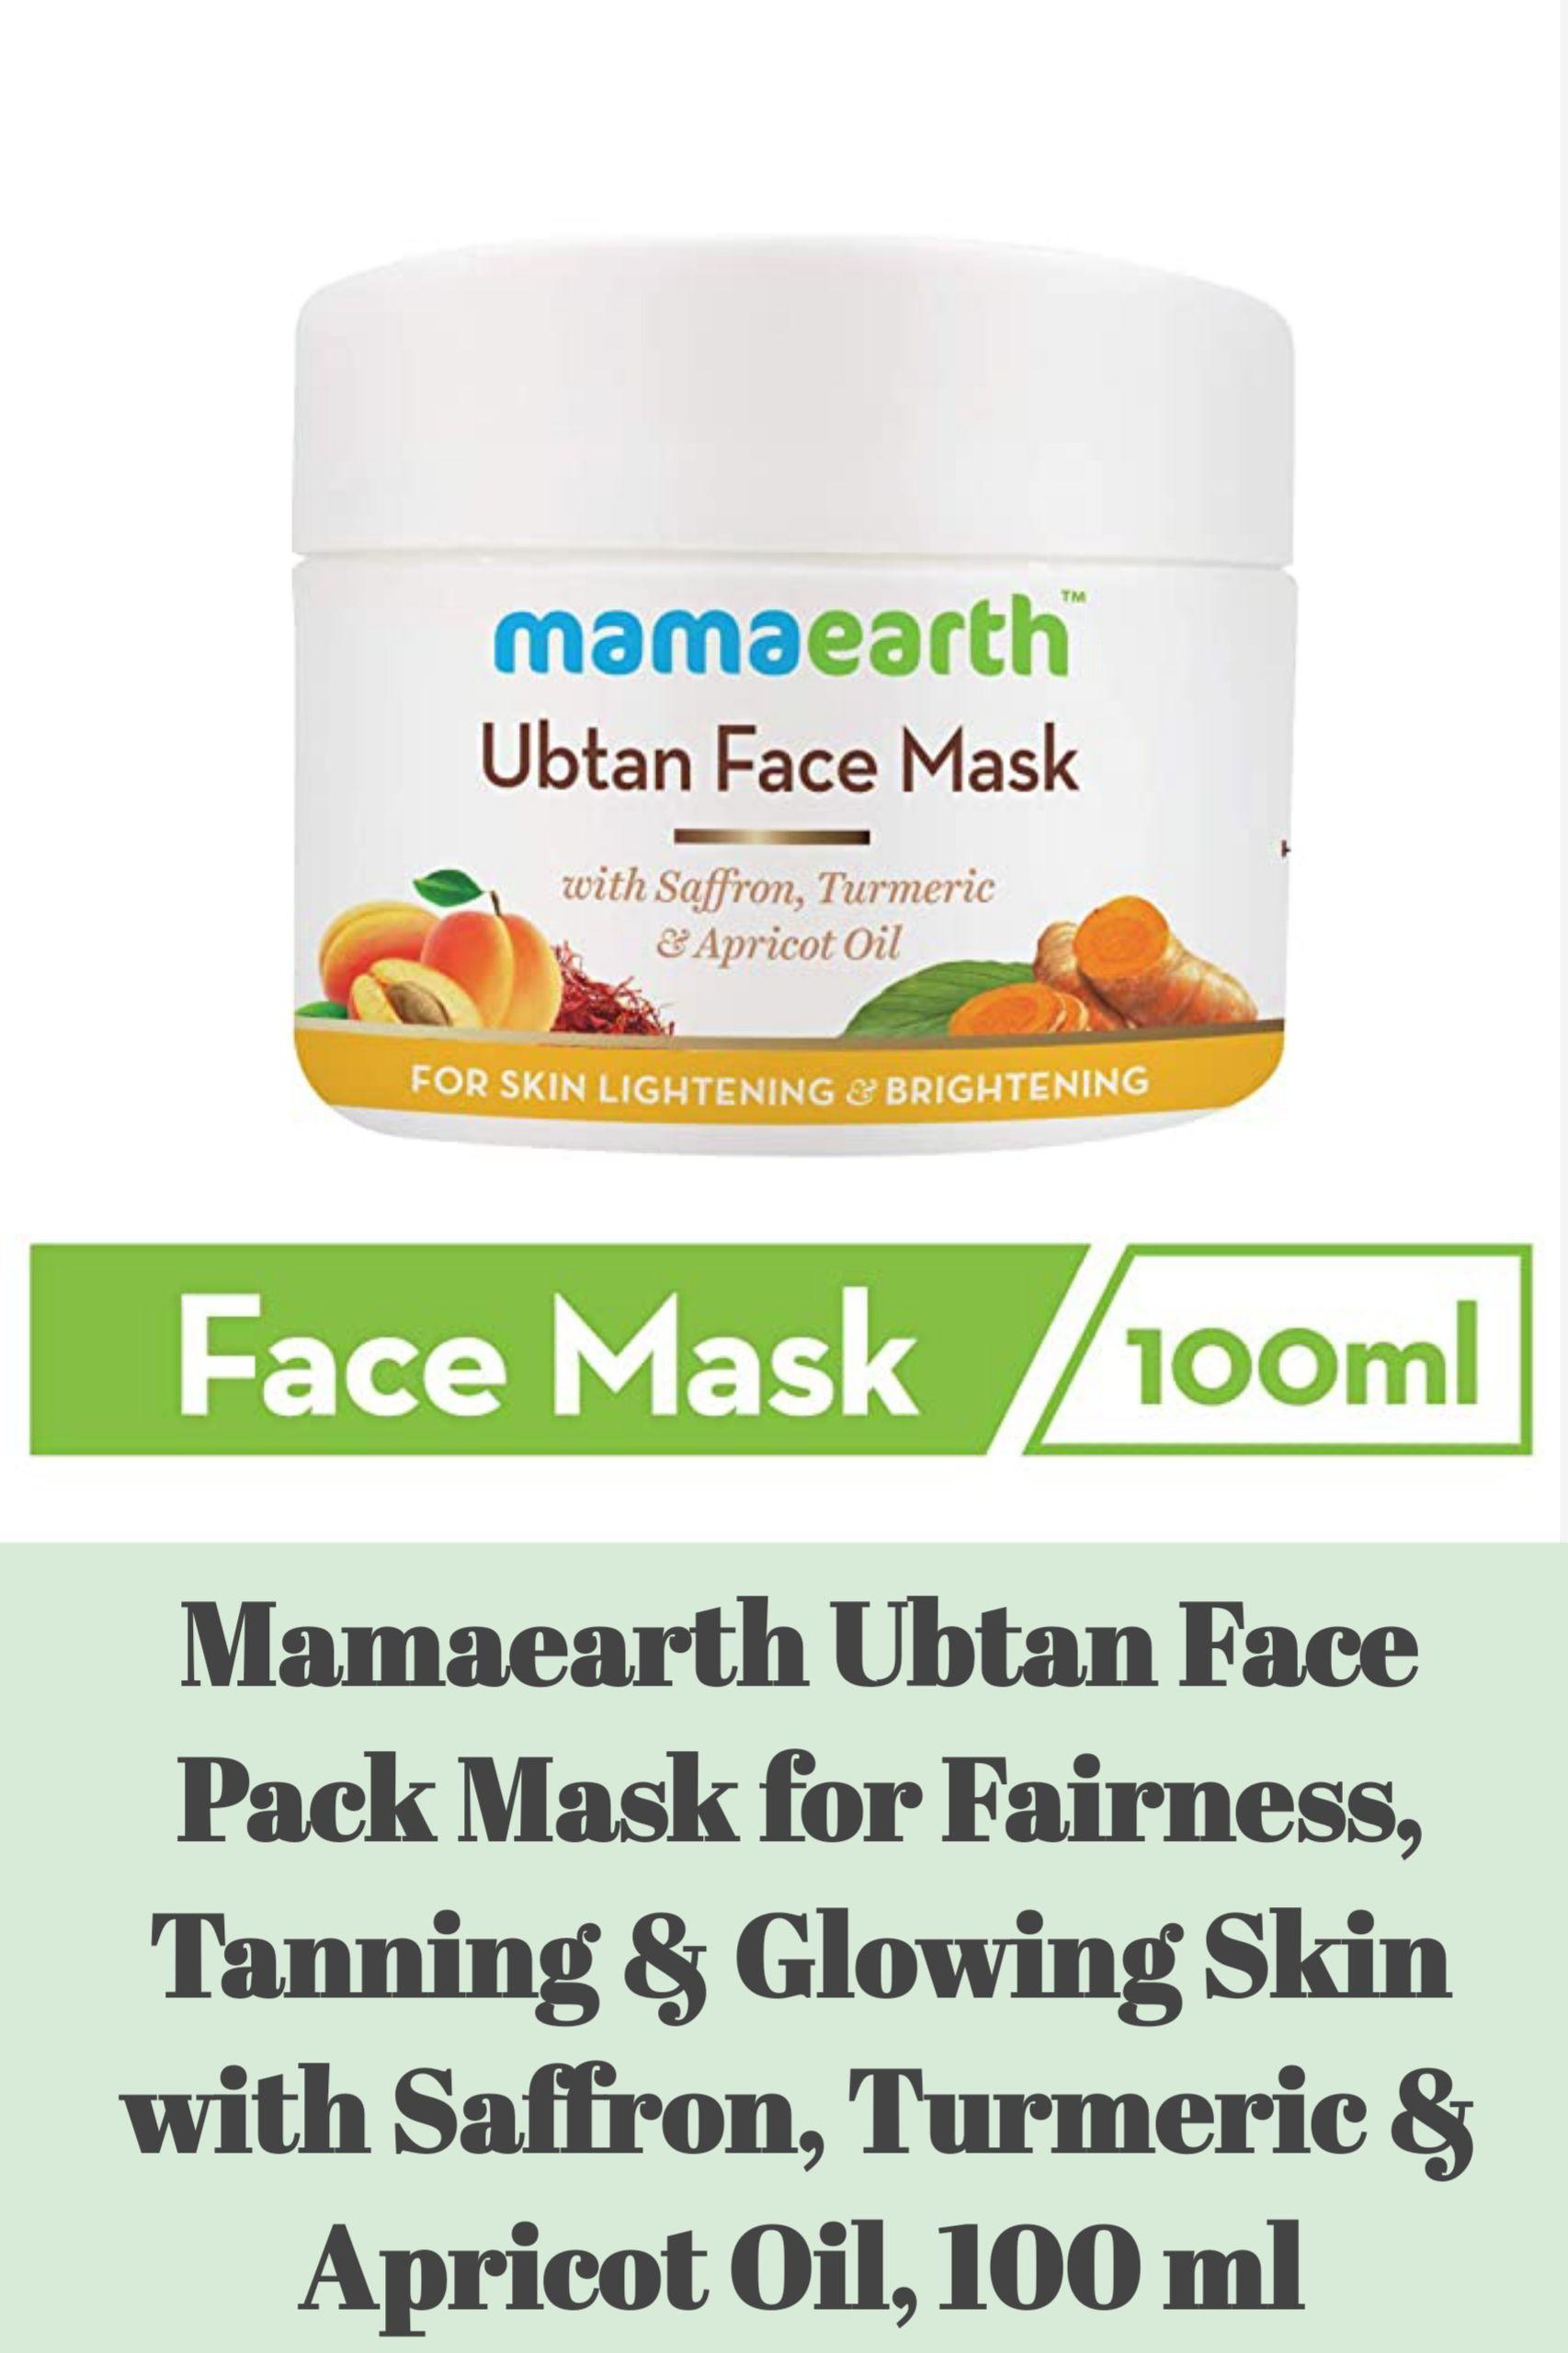 Mama Earth Abtan Face Mask In 2020 Brightening Face Mask Glowing Tan Skin Turmeric Oil